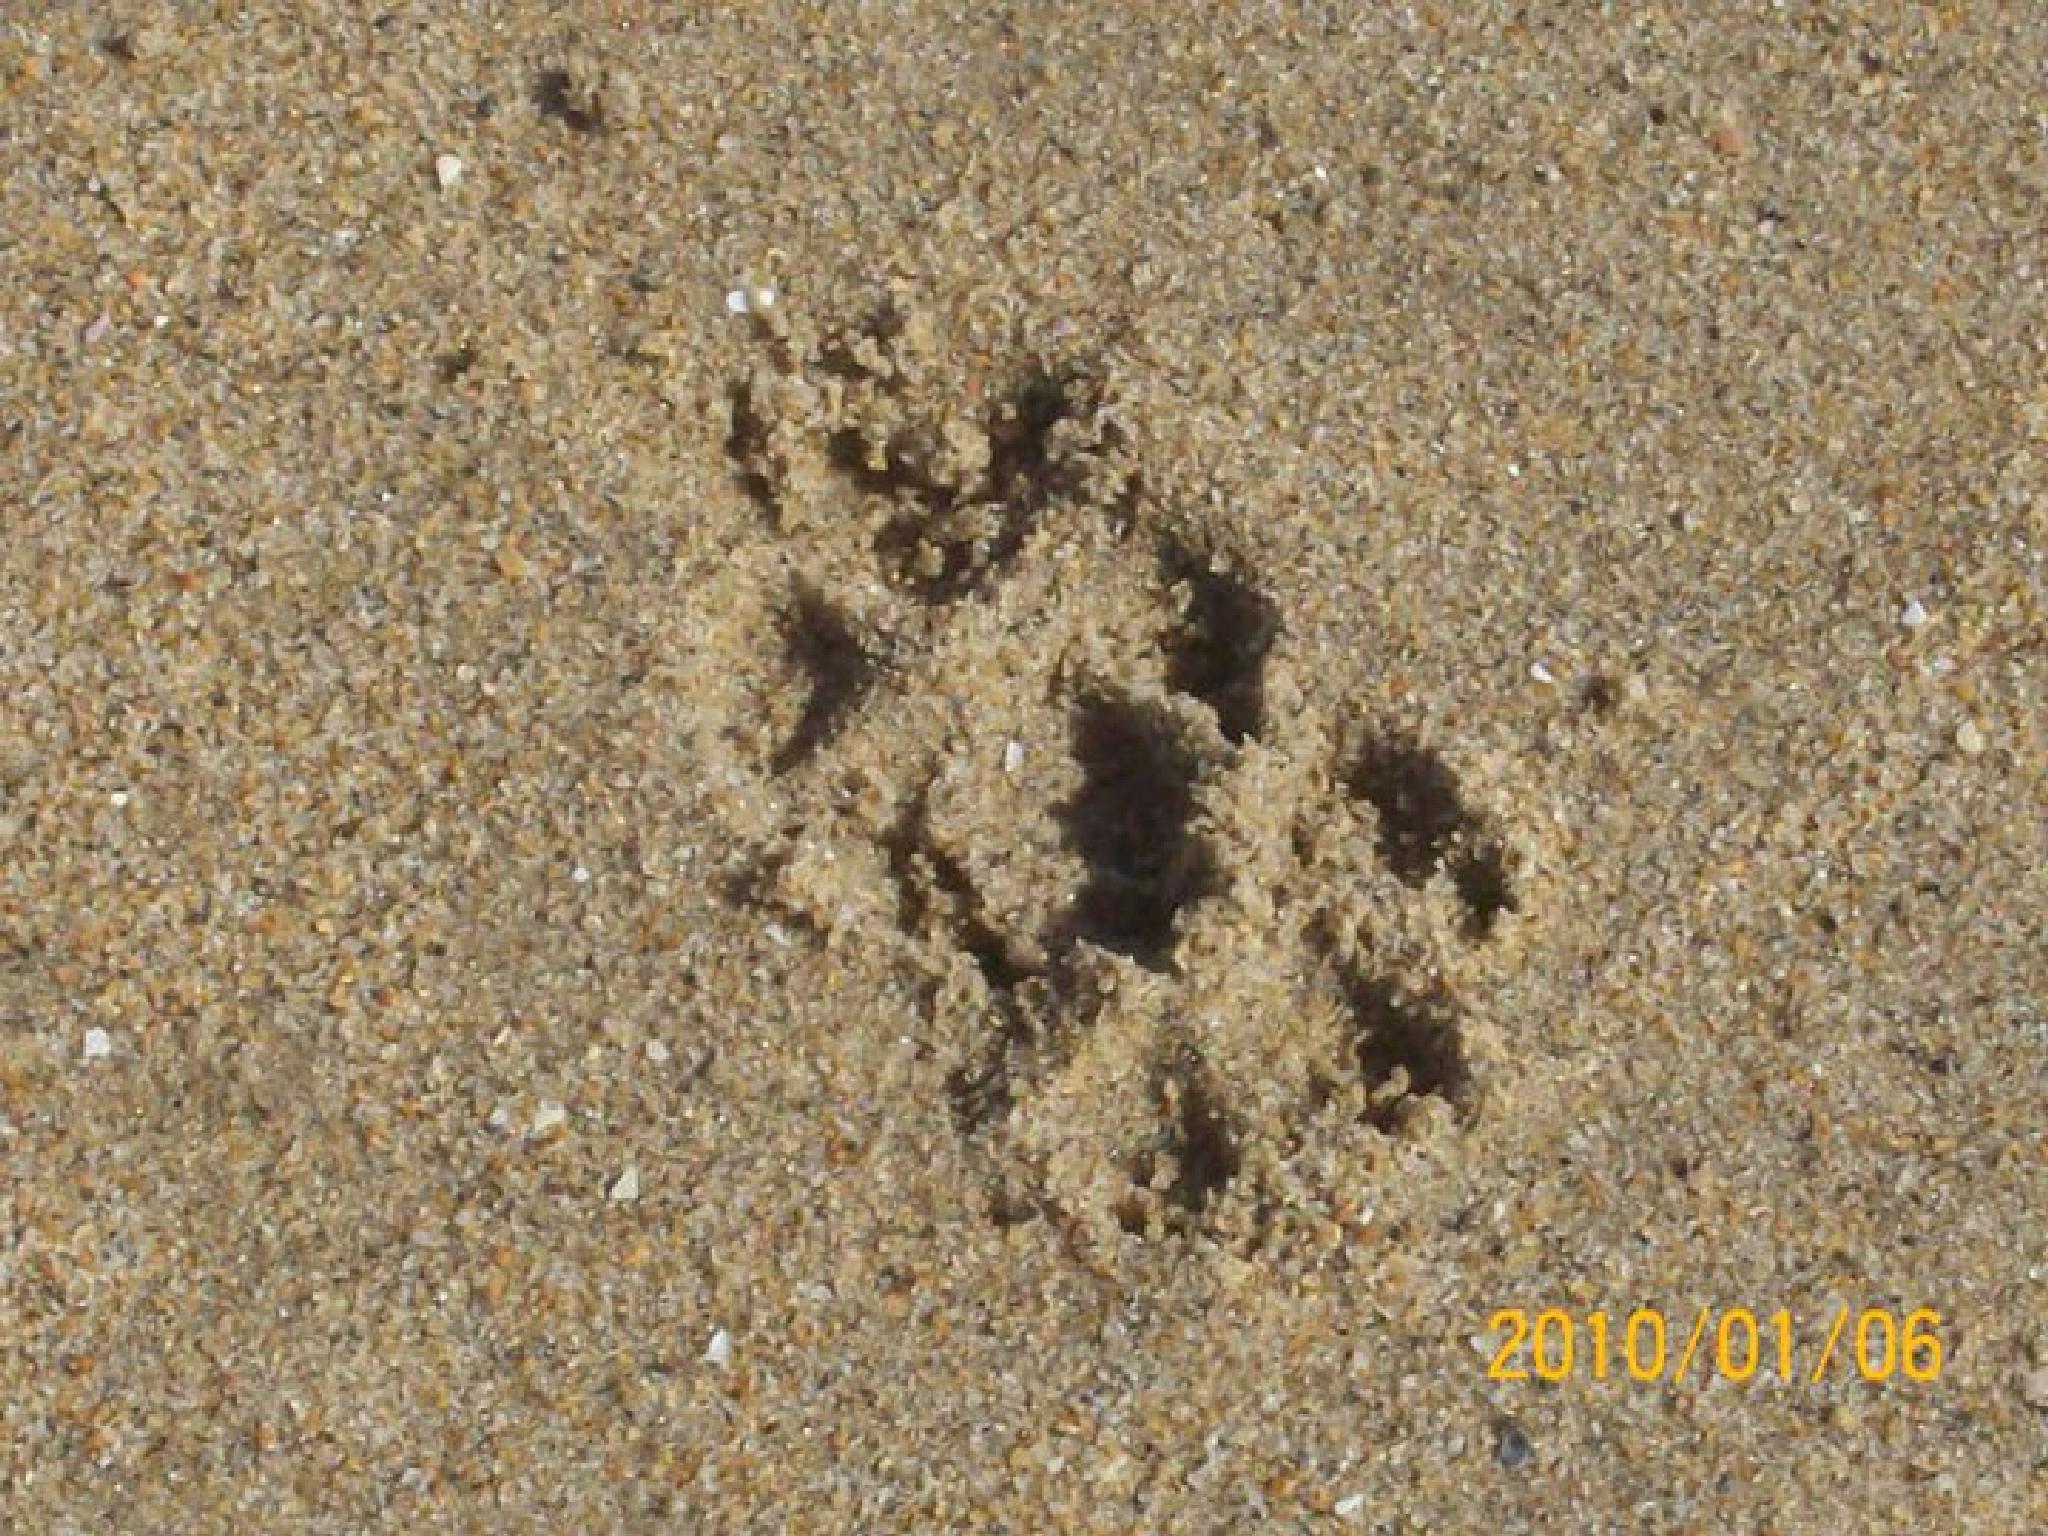 Footprints by Geanine McDonald